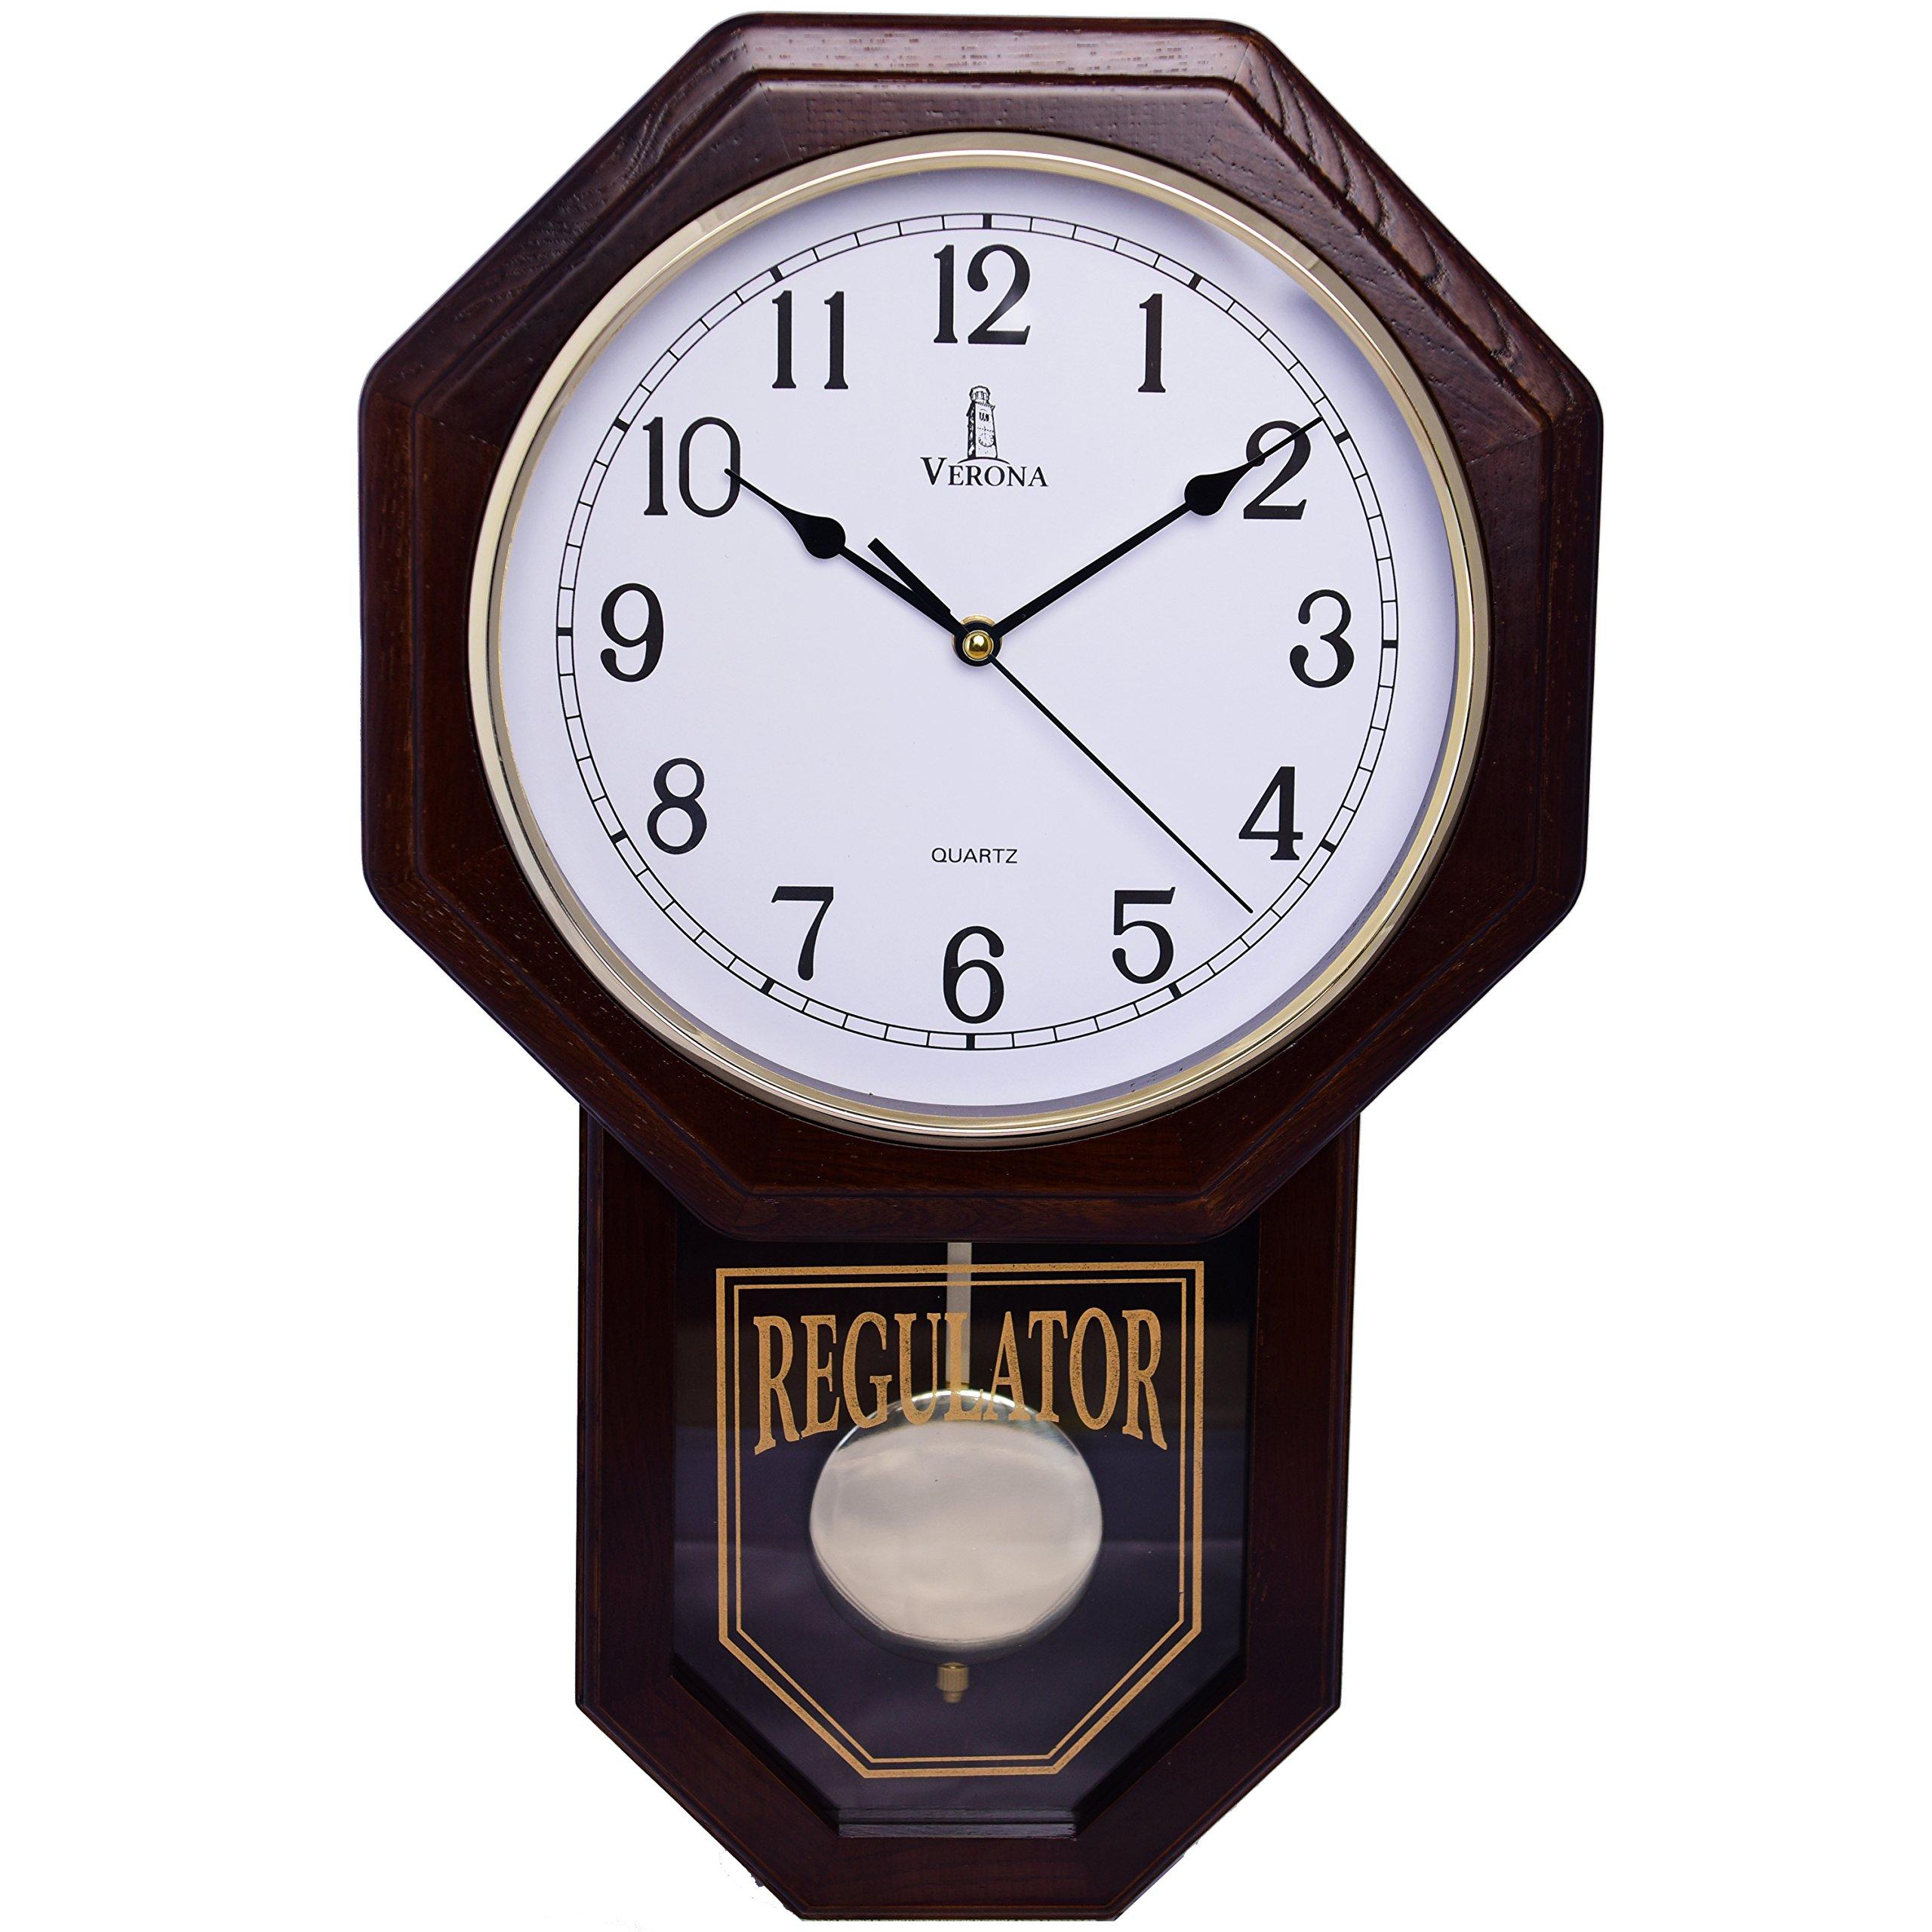 "Best Pendulum Wall Clock, Silent Decorative Wood Clock with Swinging Pendulum, Battery Operated, Schoolhouse Regulator Wooden Design, For Living Room, Bathroom, Kitchen & Home Décor, 18'' x 11.25"""